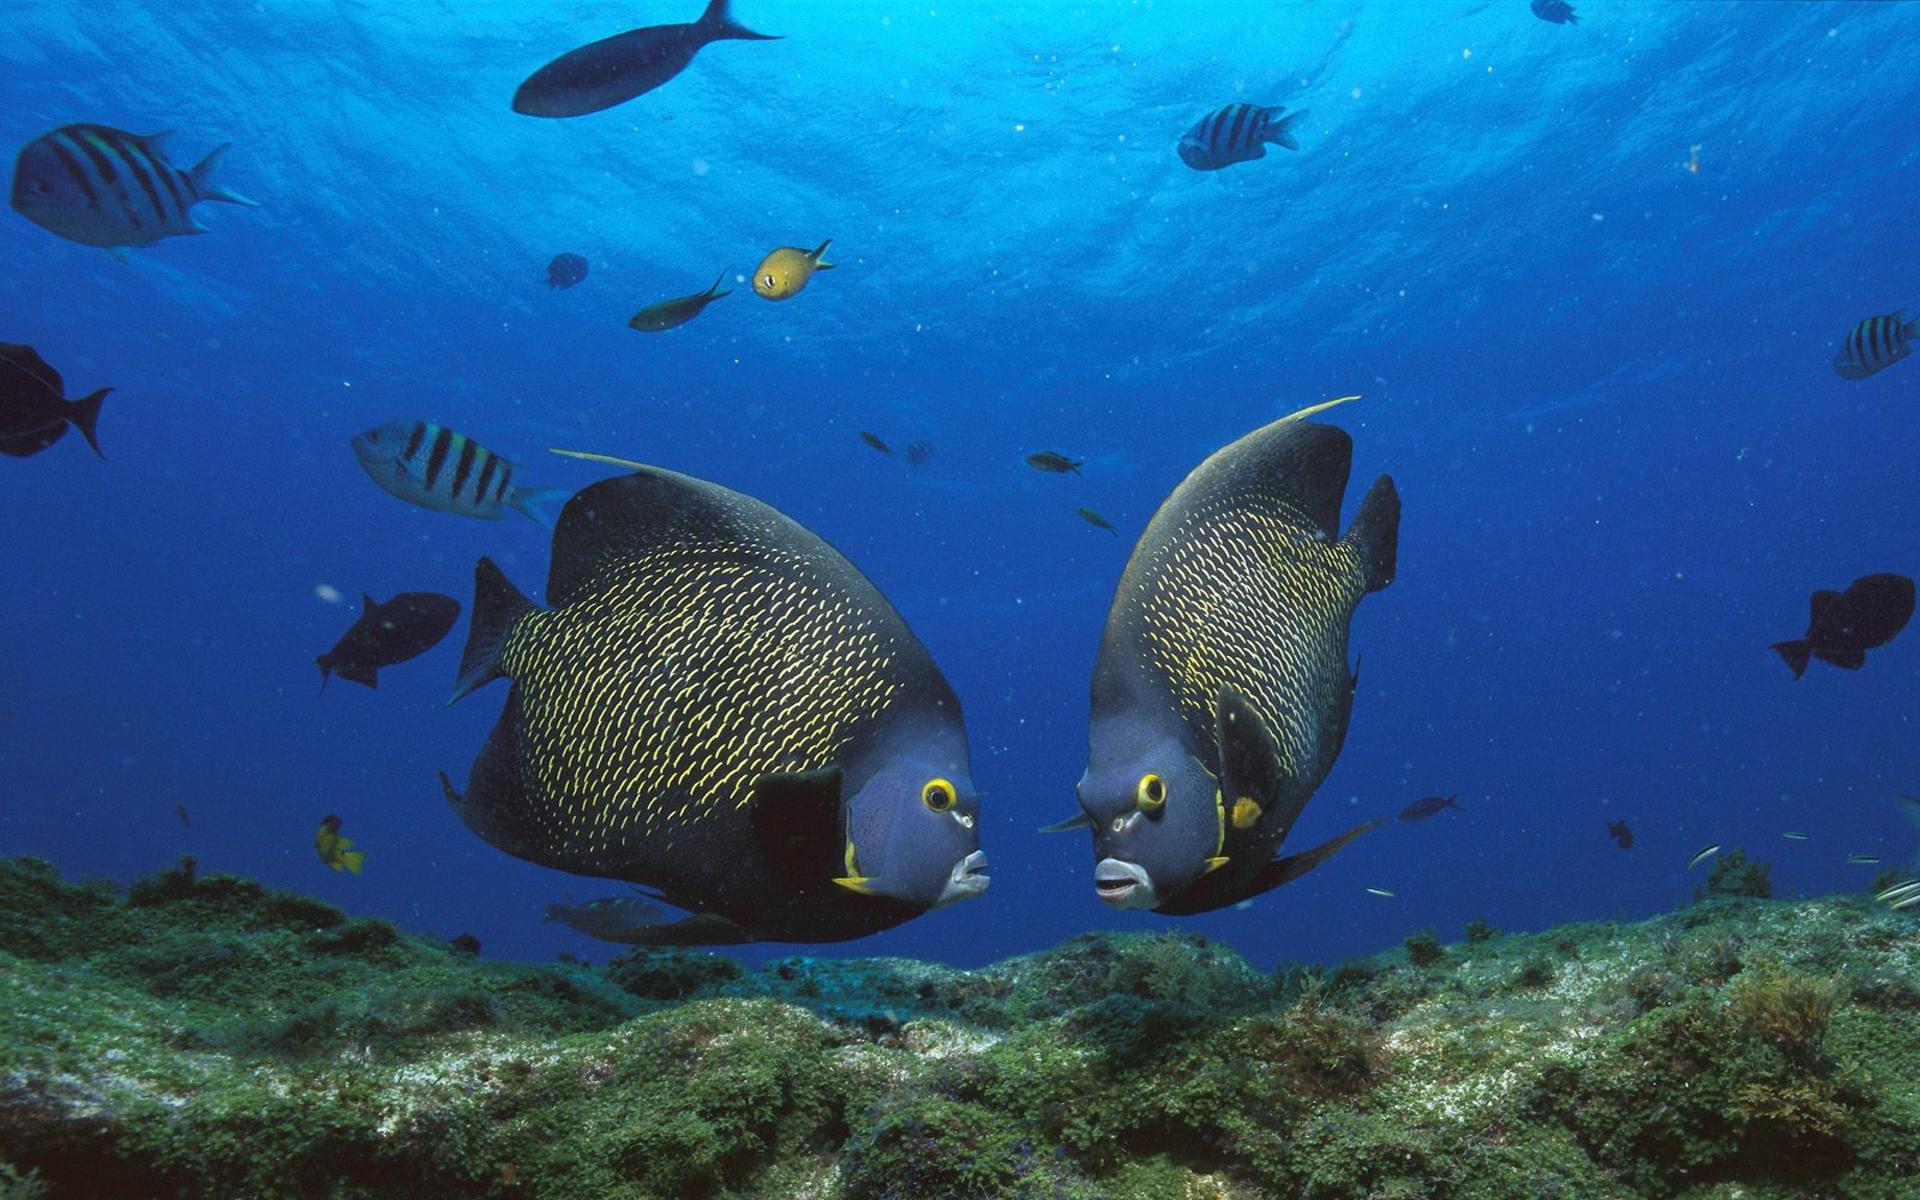 fish marlin desktop 1920x1200 - photo #30